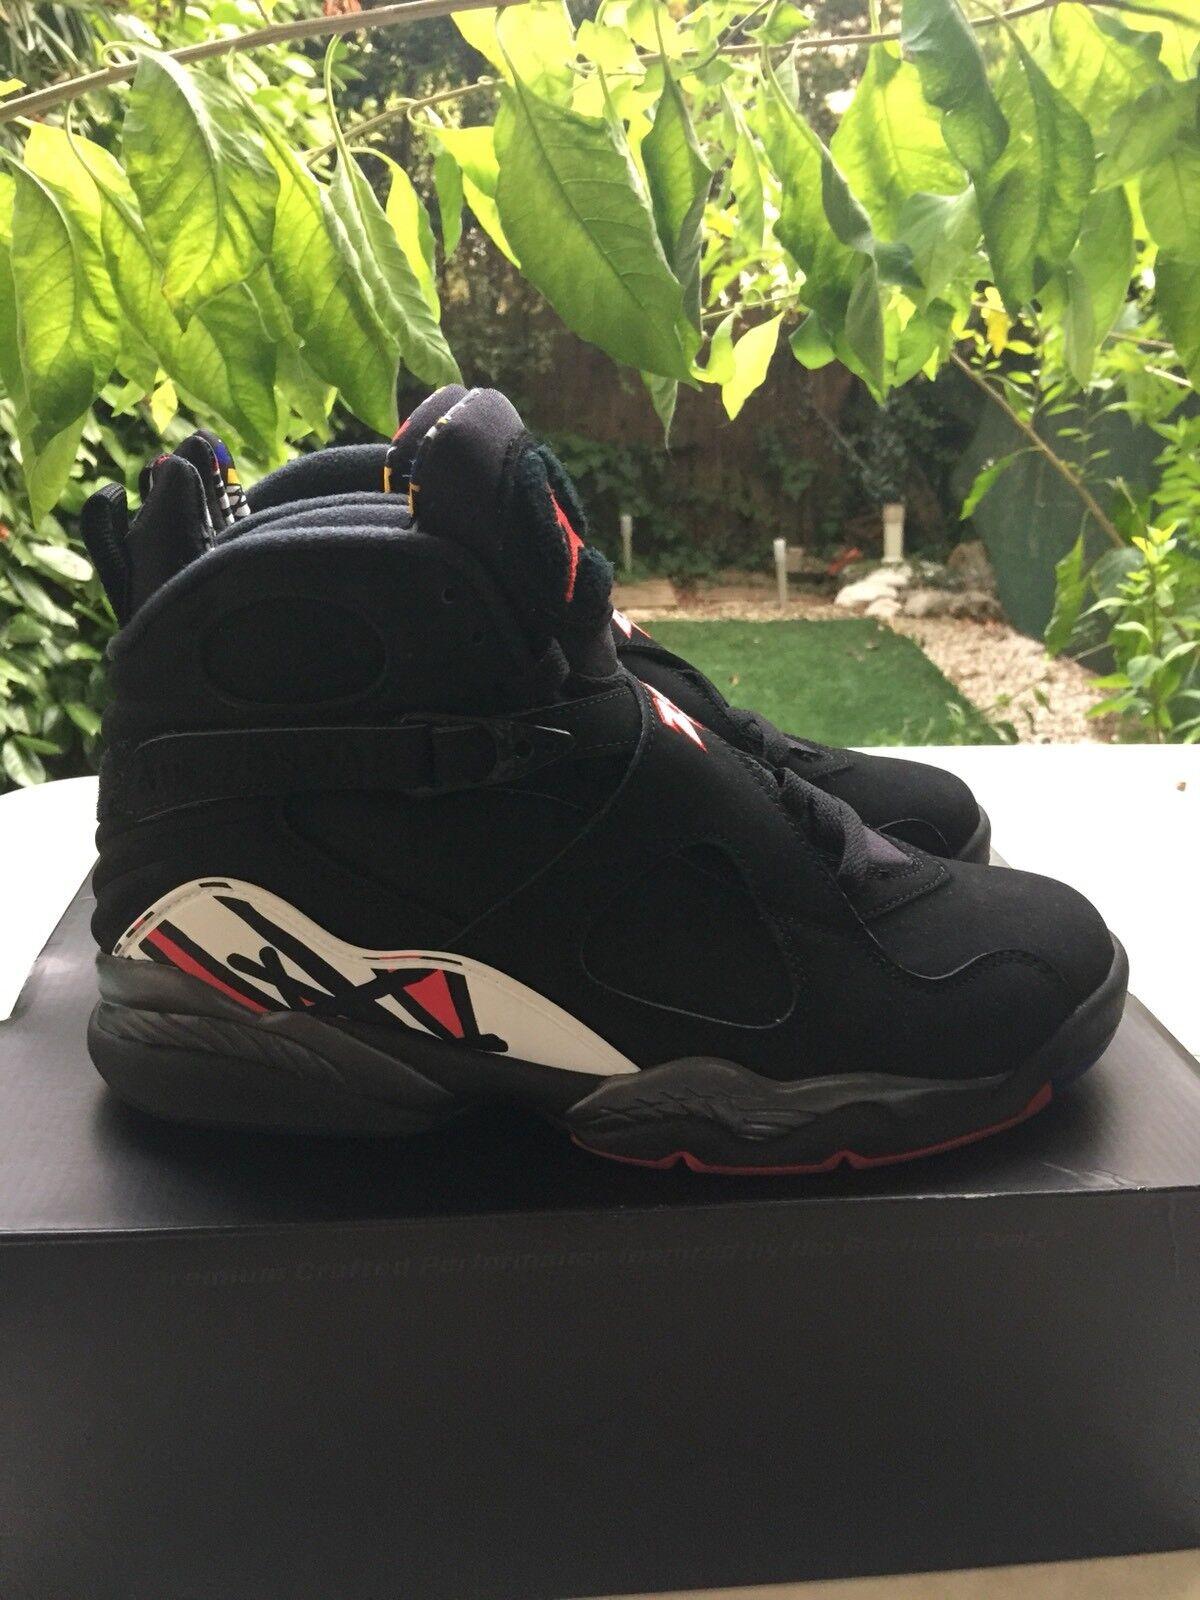 Nike Air Jordan 8 Playoff.                                      42eu 8,5us 7,5uk | Nuovo Prodotto  | Uomo/Donne Scarpa